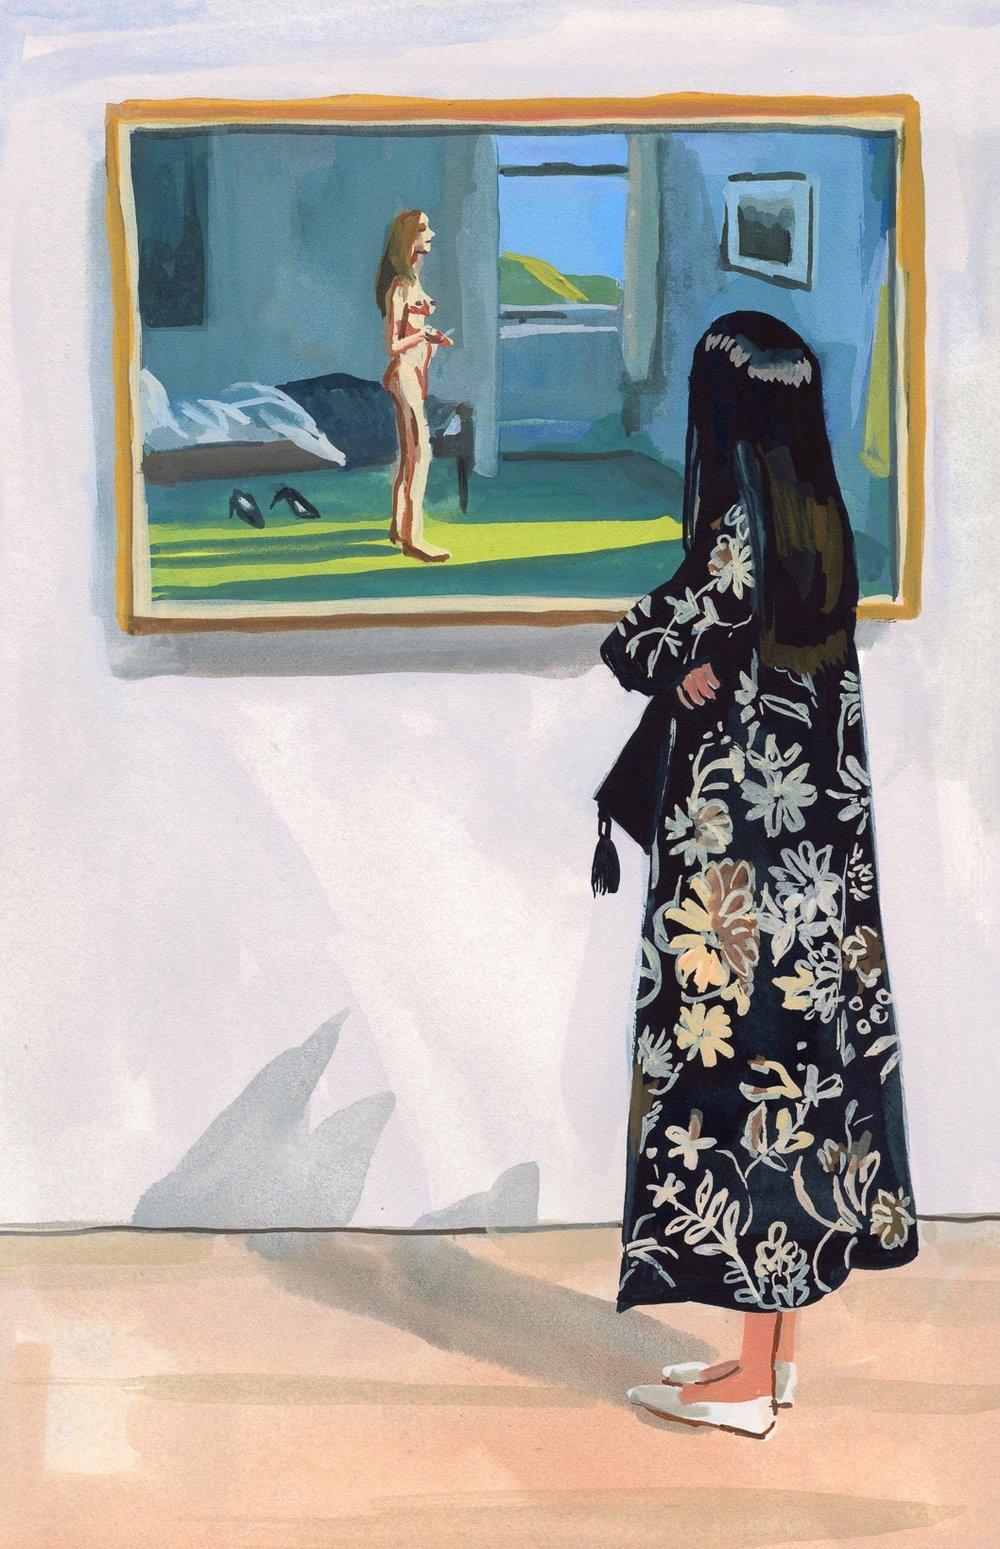 SOI 61 2018 - ARTIST: Jenny KroikTITLE: Hopper [6 of 6]